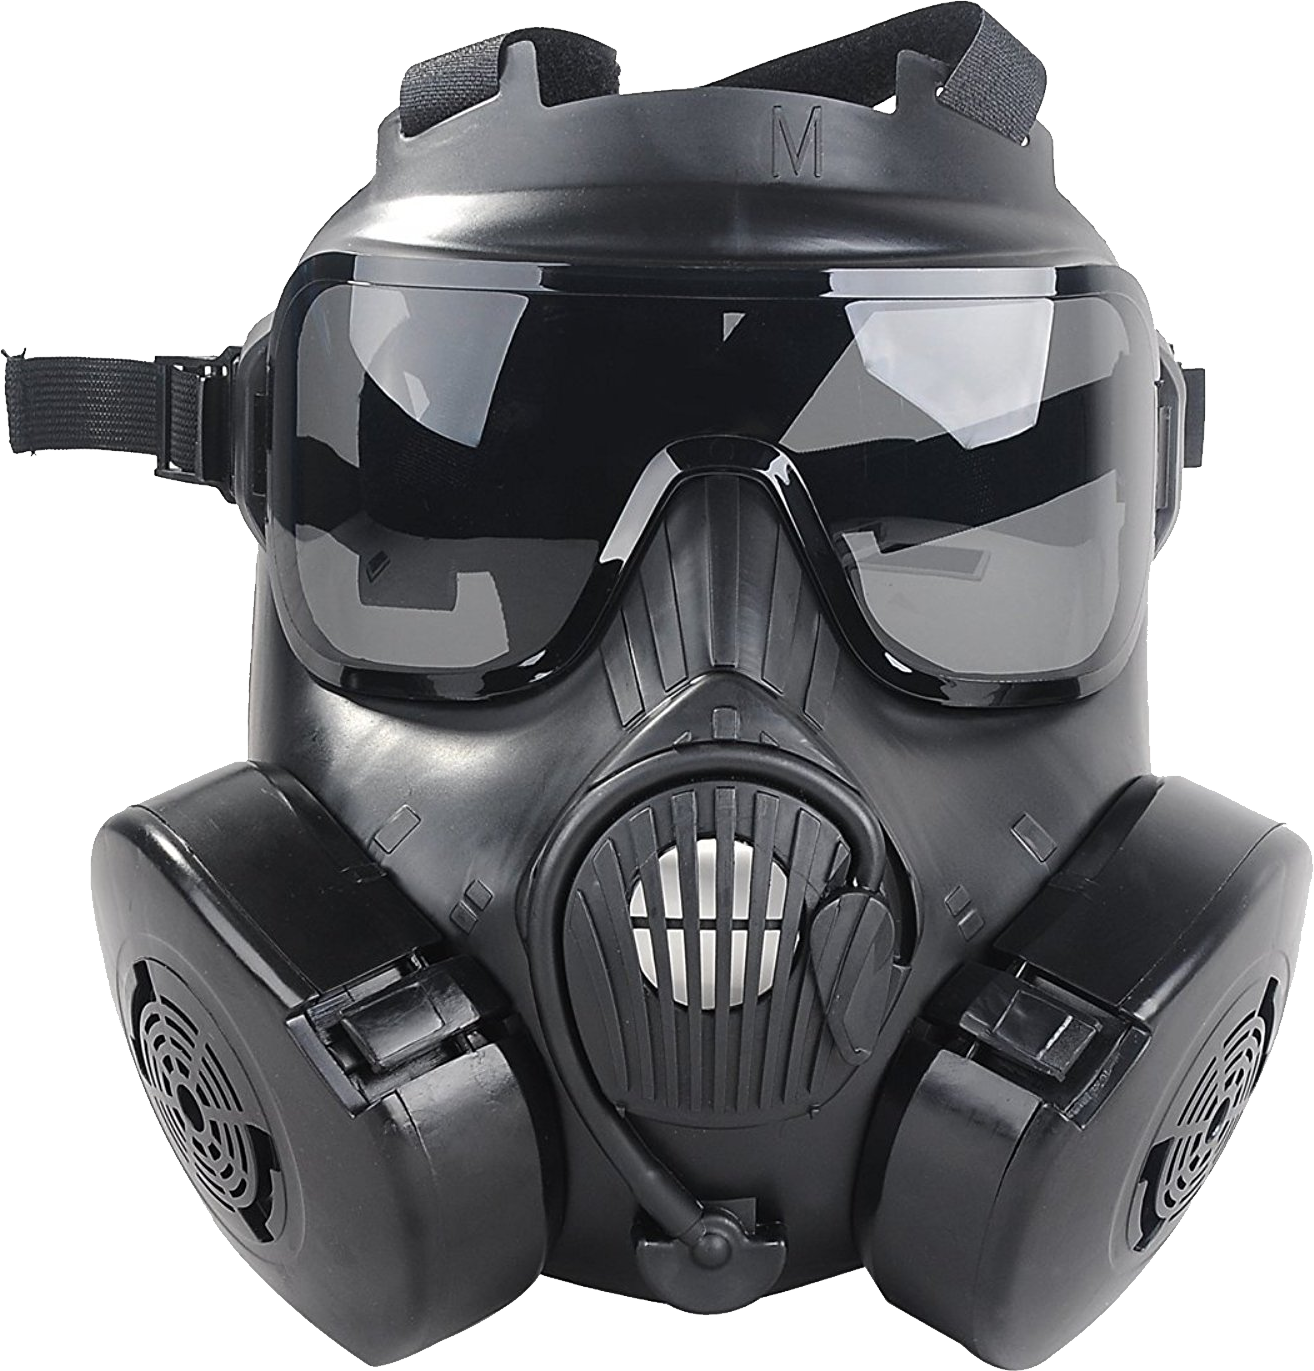 Gas Mask Png Image Gas Mask Airsoft Mask Gas Mask Art